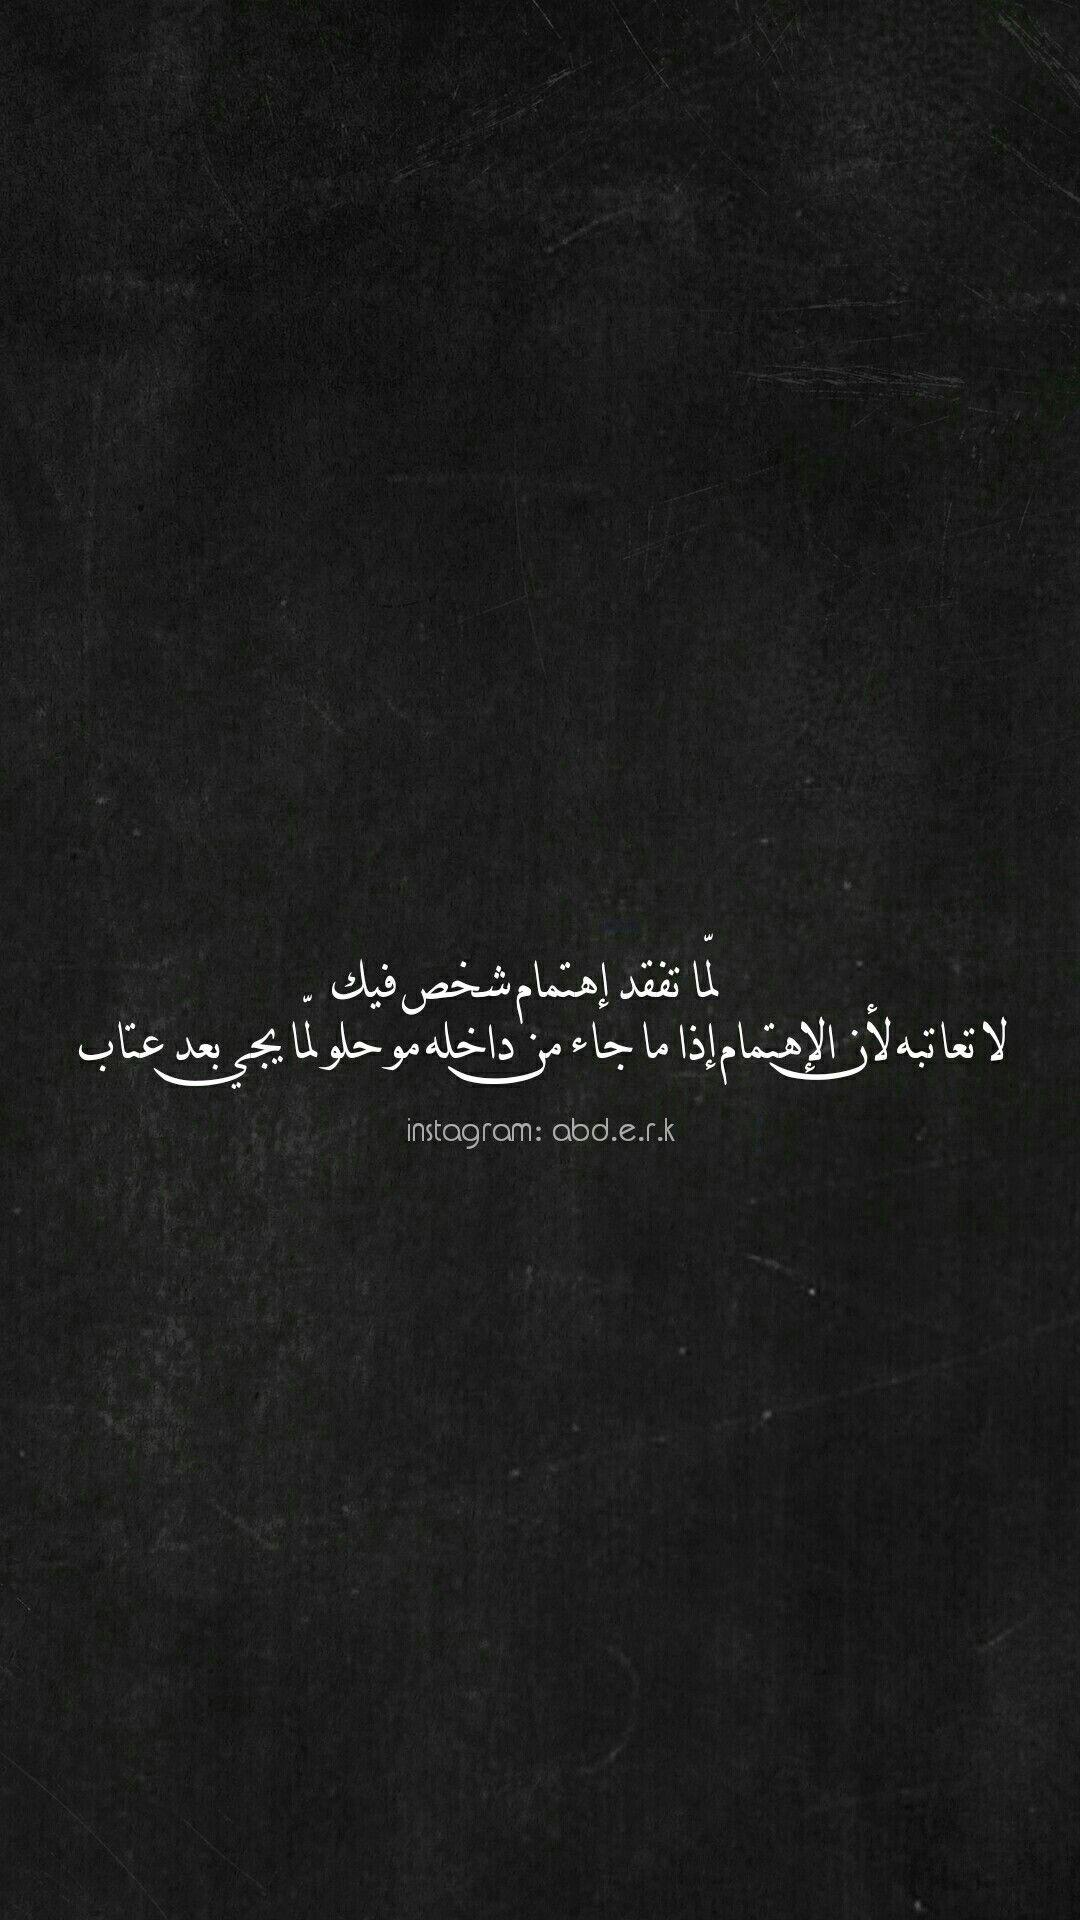 لما تفقد إهتمام شخص لا تعاتبه Arabic Quotes Quotes Instagram